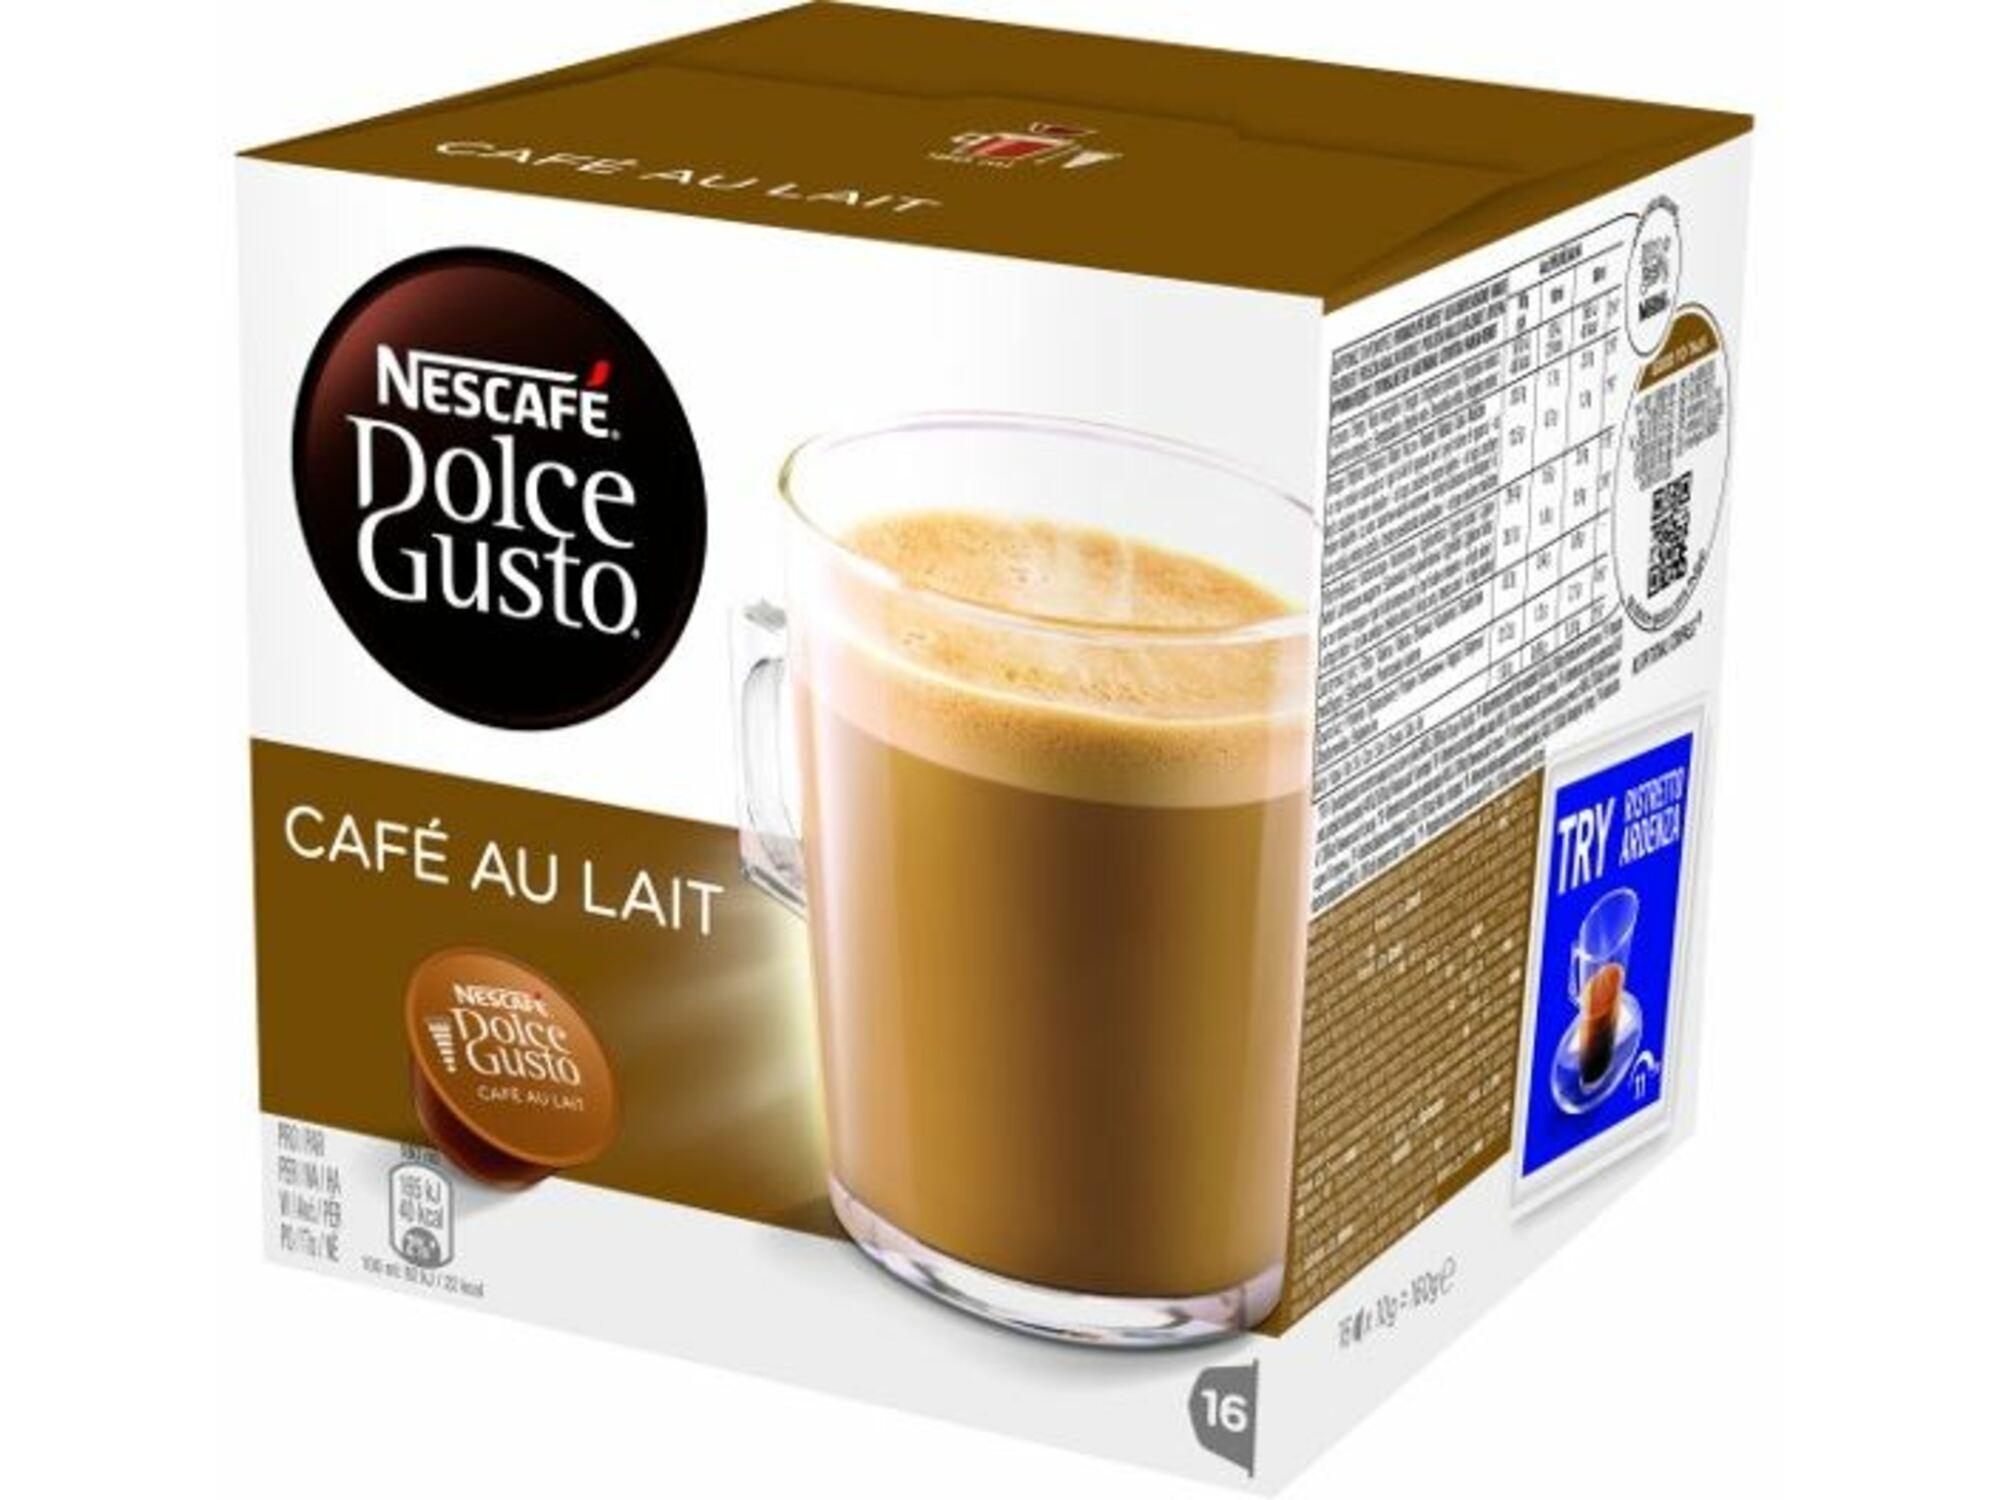 Nestle kavne kapsule Dolce Gusto Cafe Au Lait 160 g - 16 kos